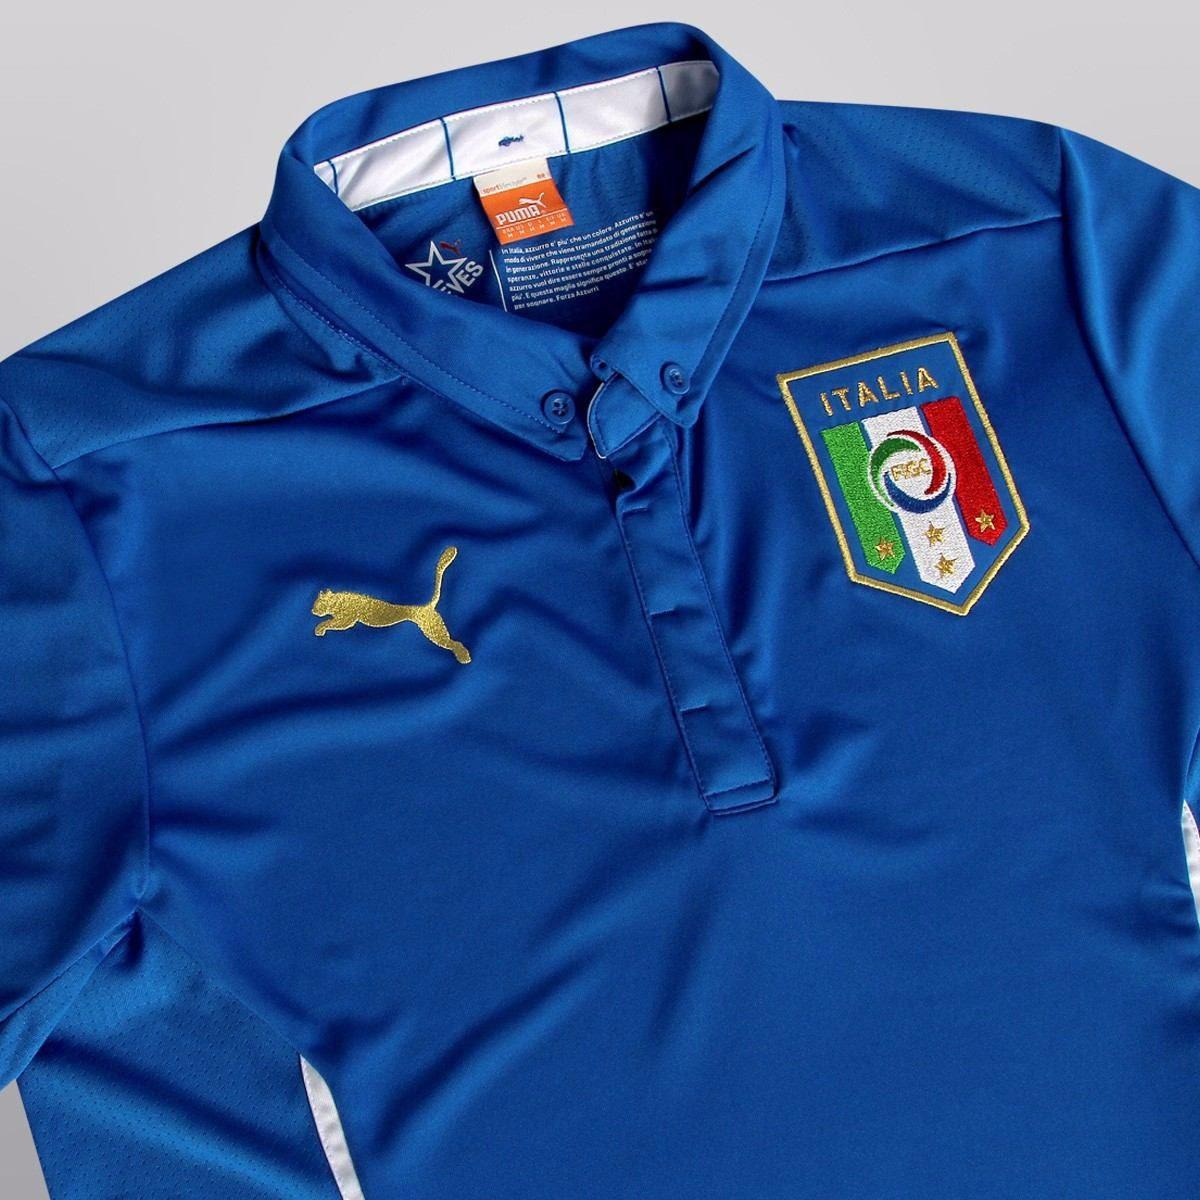 d4ccab6d240fa Camisa Futebol Itália 2014. Frete Gratis!! Pronta Entrega - R  125 ...